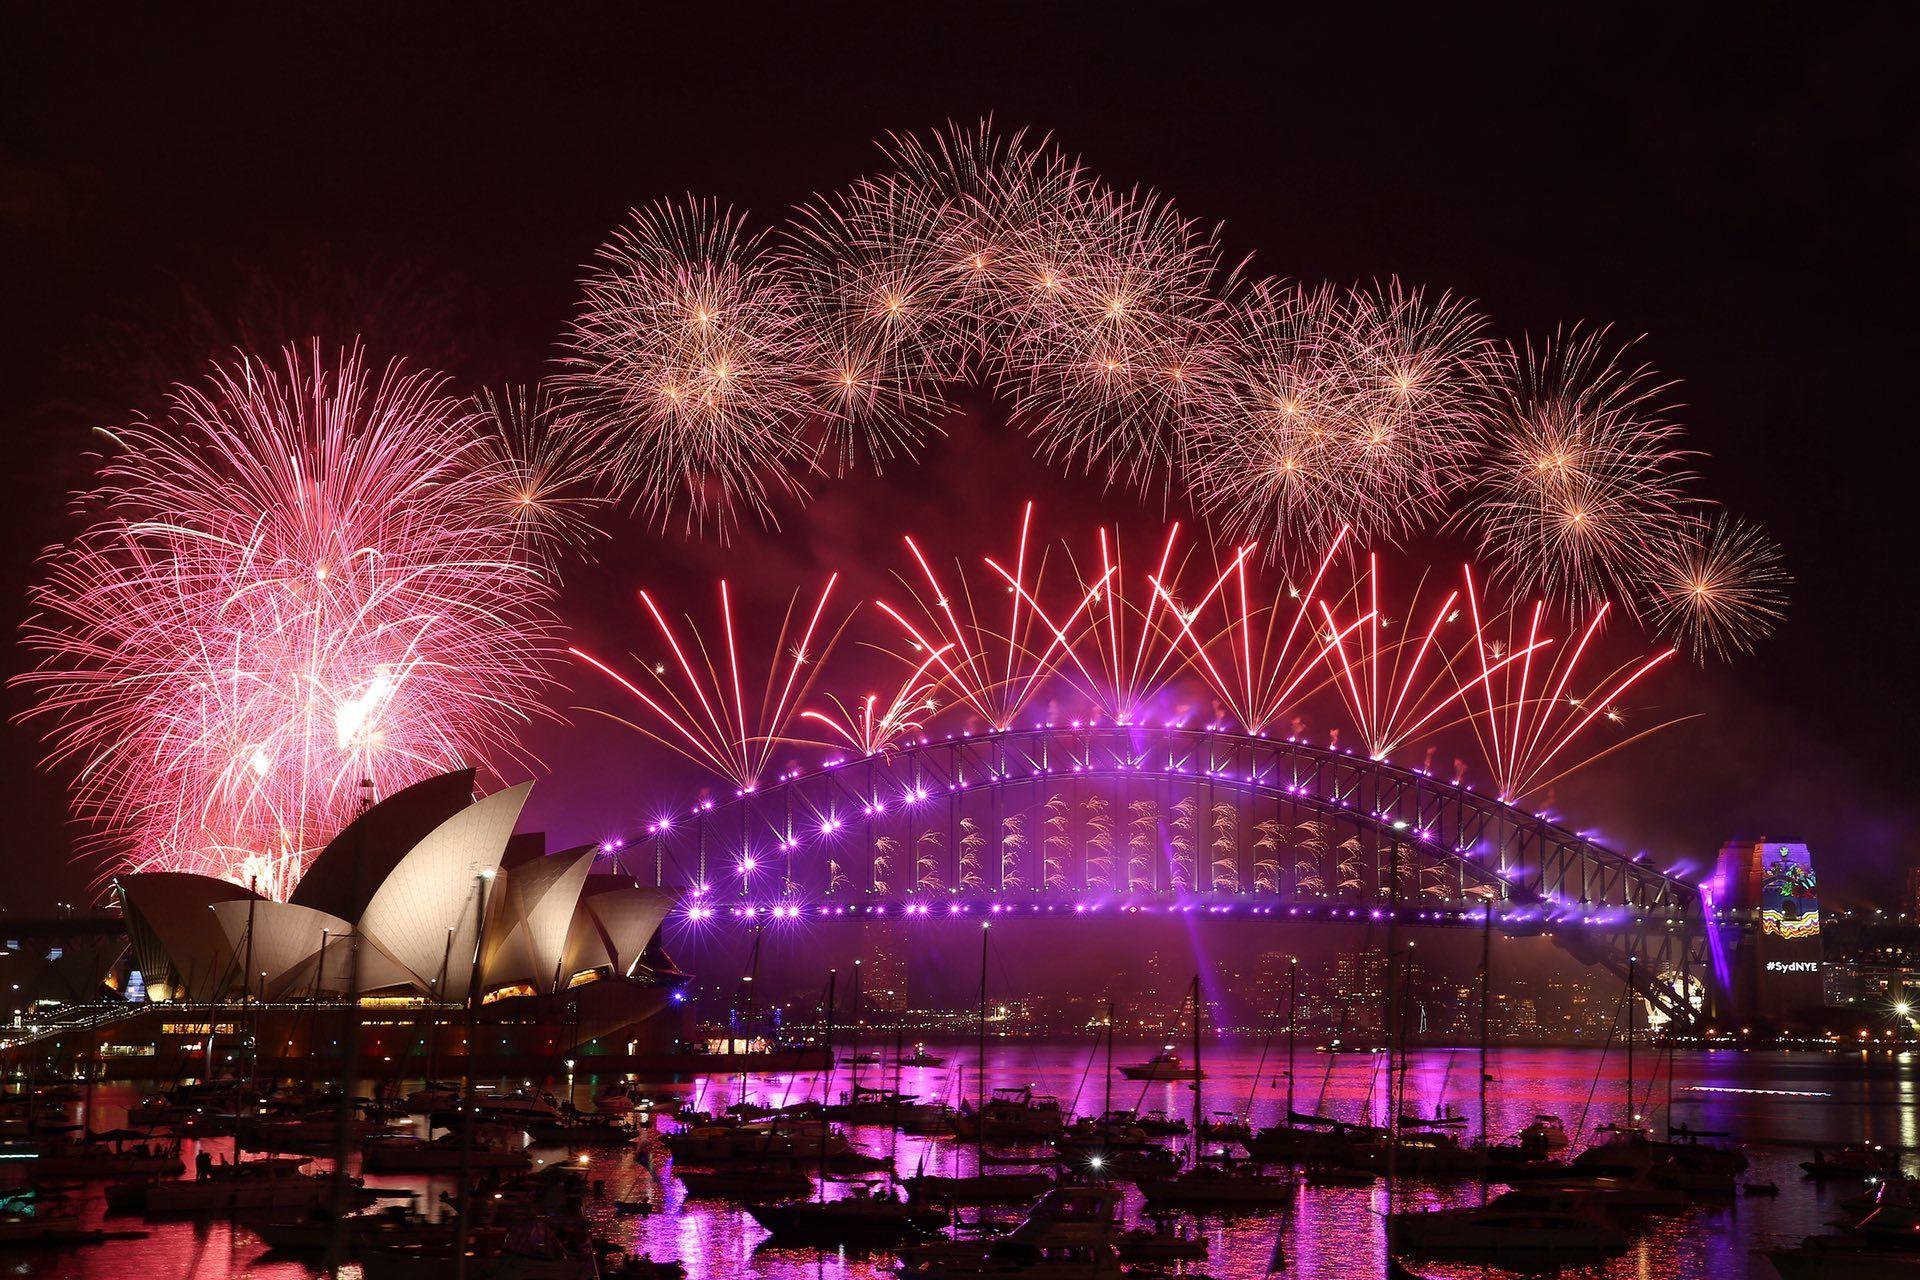 Sydney 31 Dec 2016 New Years Eve Fireworks Sydney New Years Eve New Years Eve